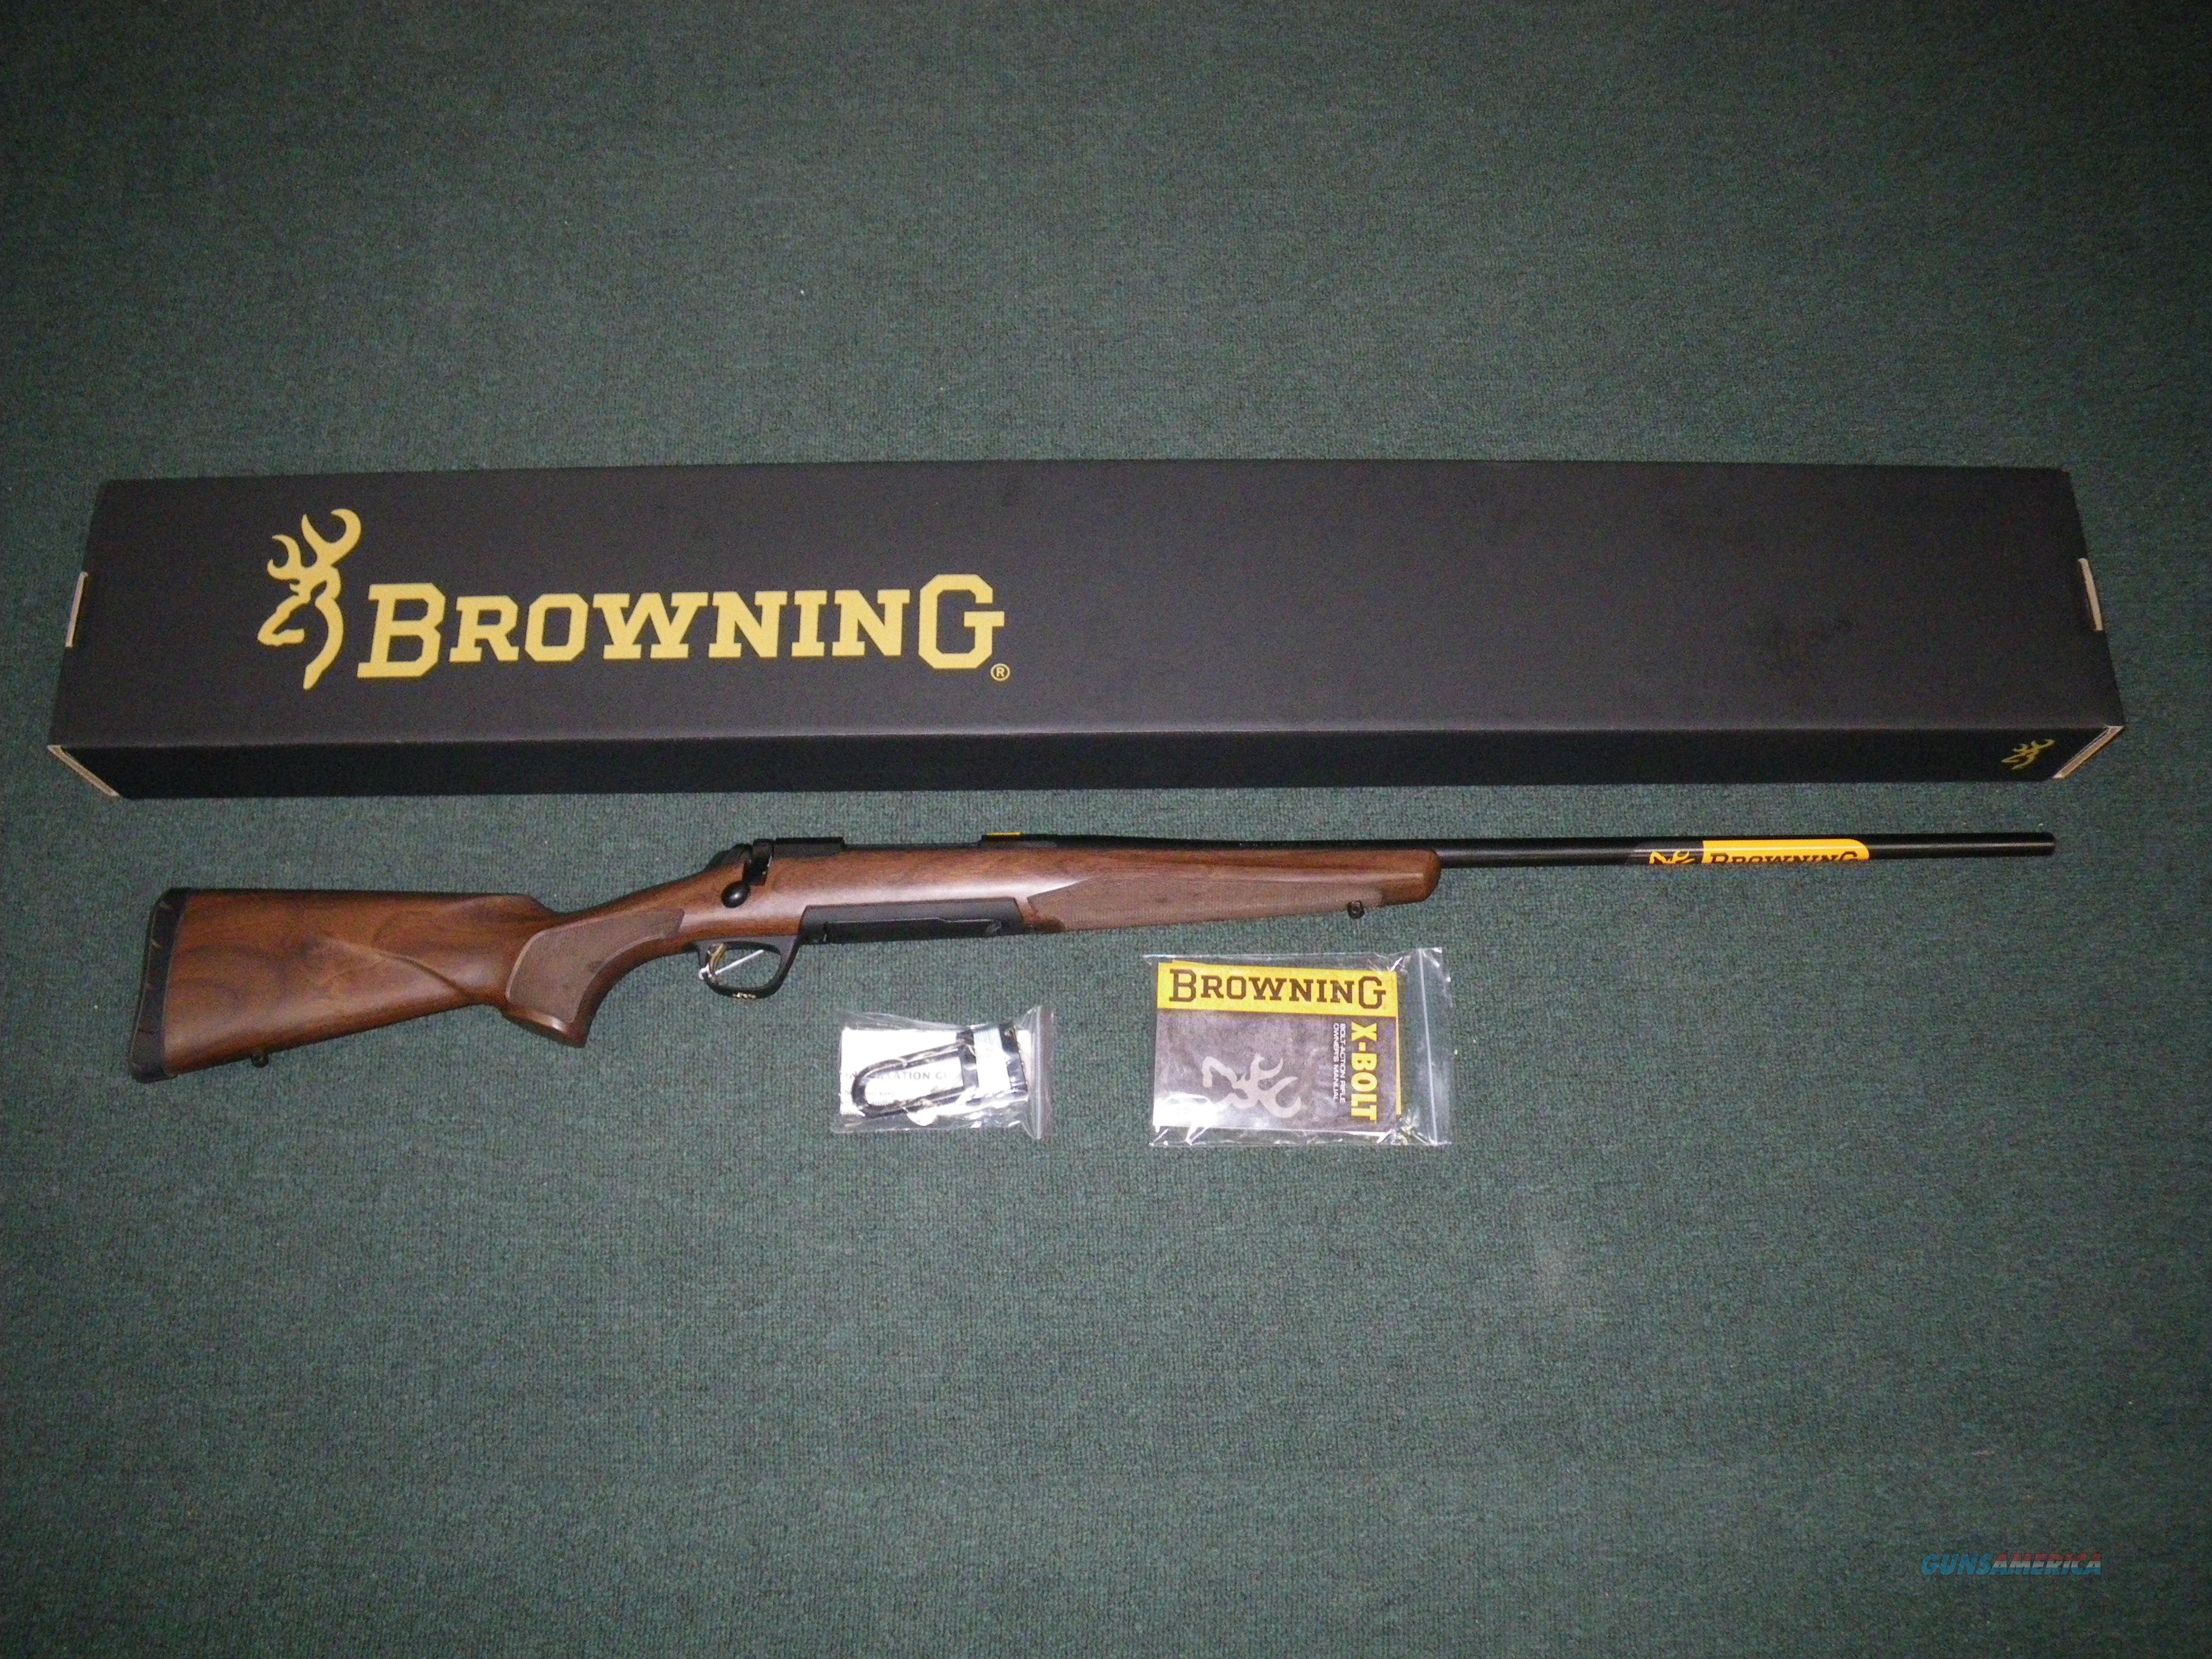 "Browning X-Bolt Hunter Blue/Walnut 300 Win Mag 26"" #035208229  Guns > Rifles > Browning Rifles > Bolt Action > Hunting > Blue"